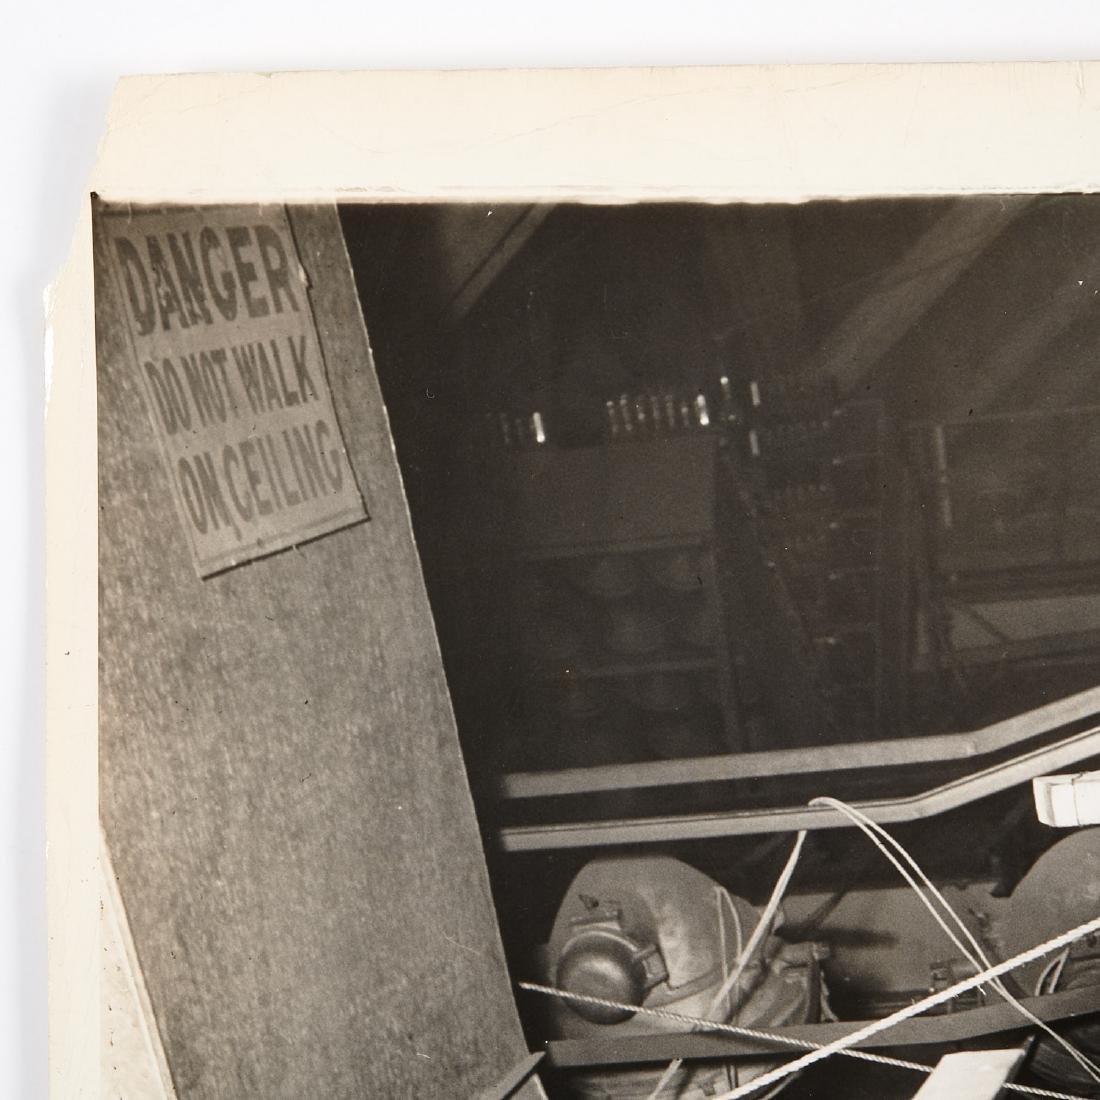 Weegee, photograph - 3